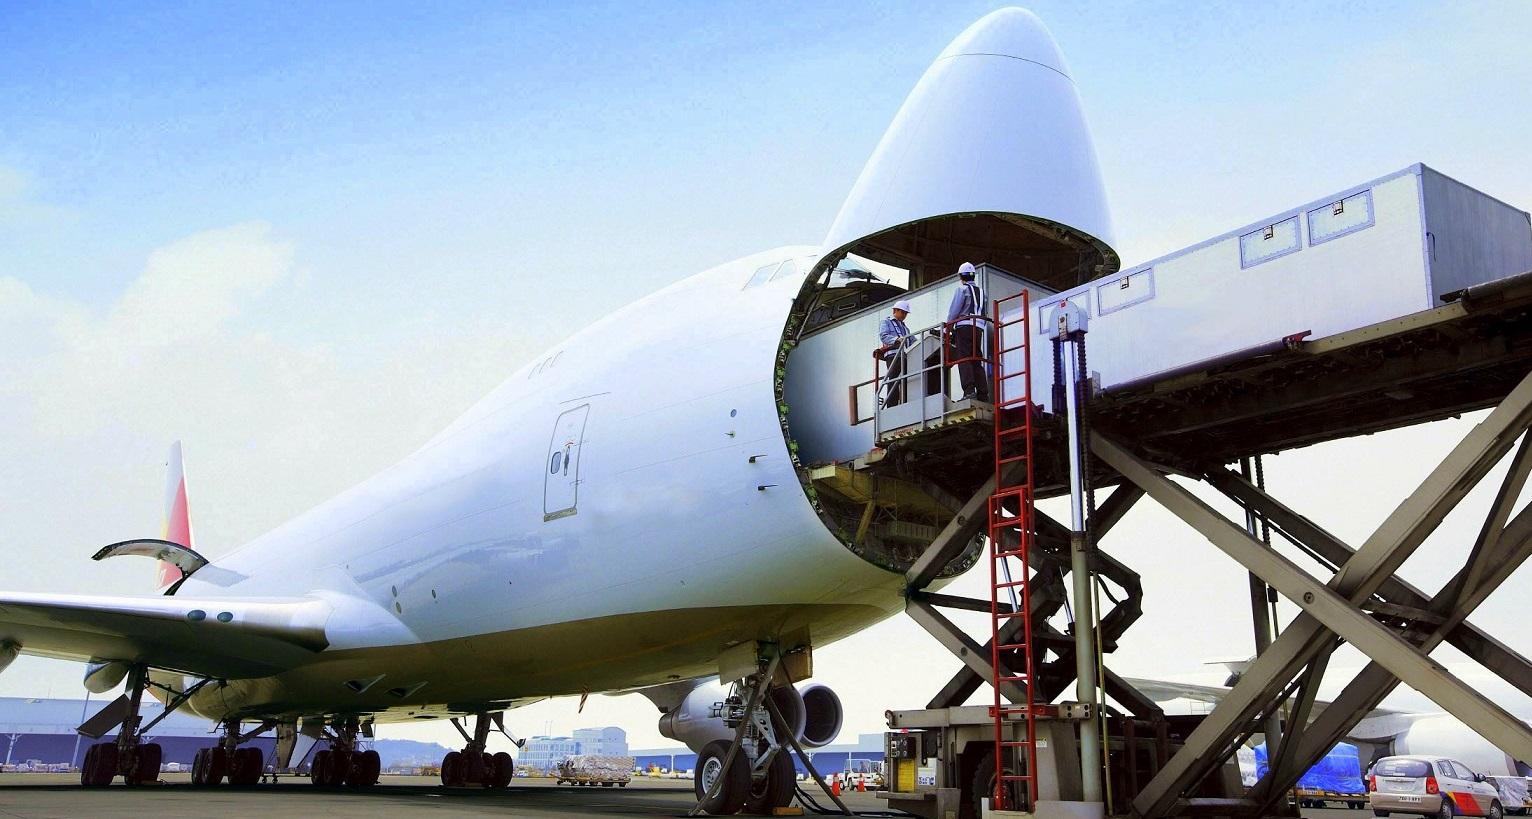 پست بین المللی یا حمل و نقل بین المللی کارگو